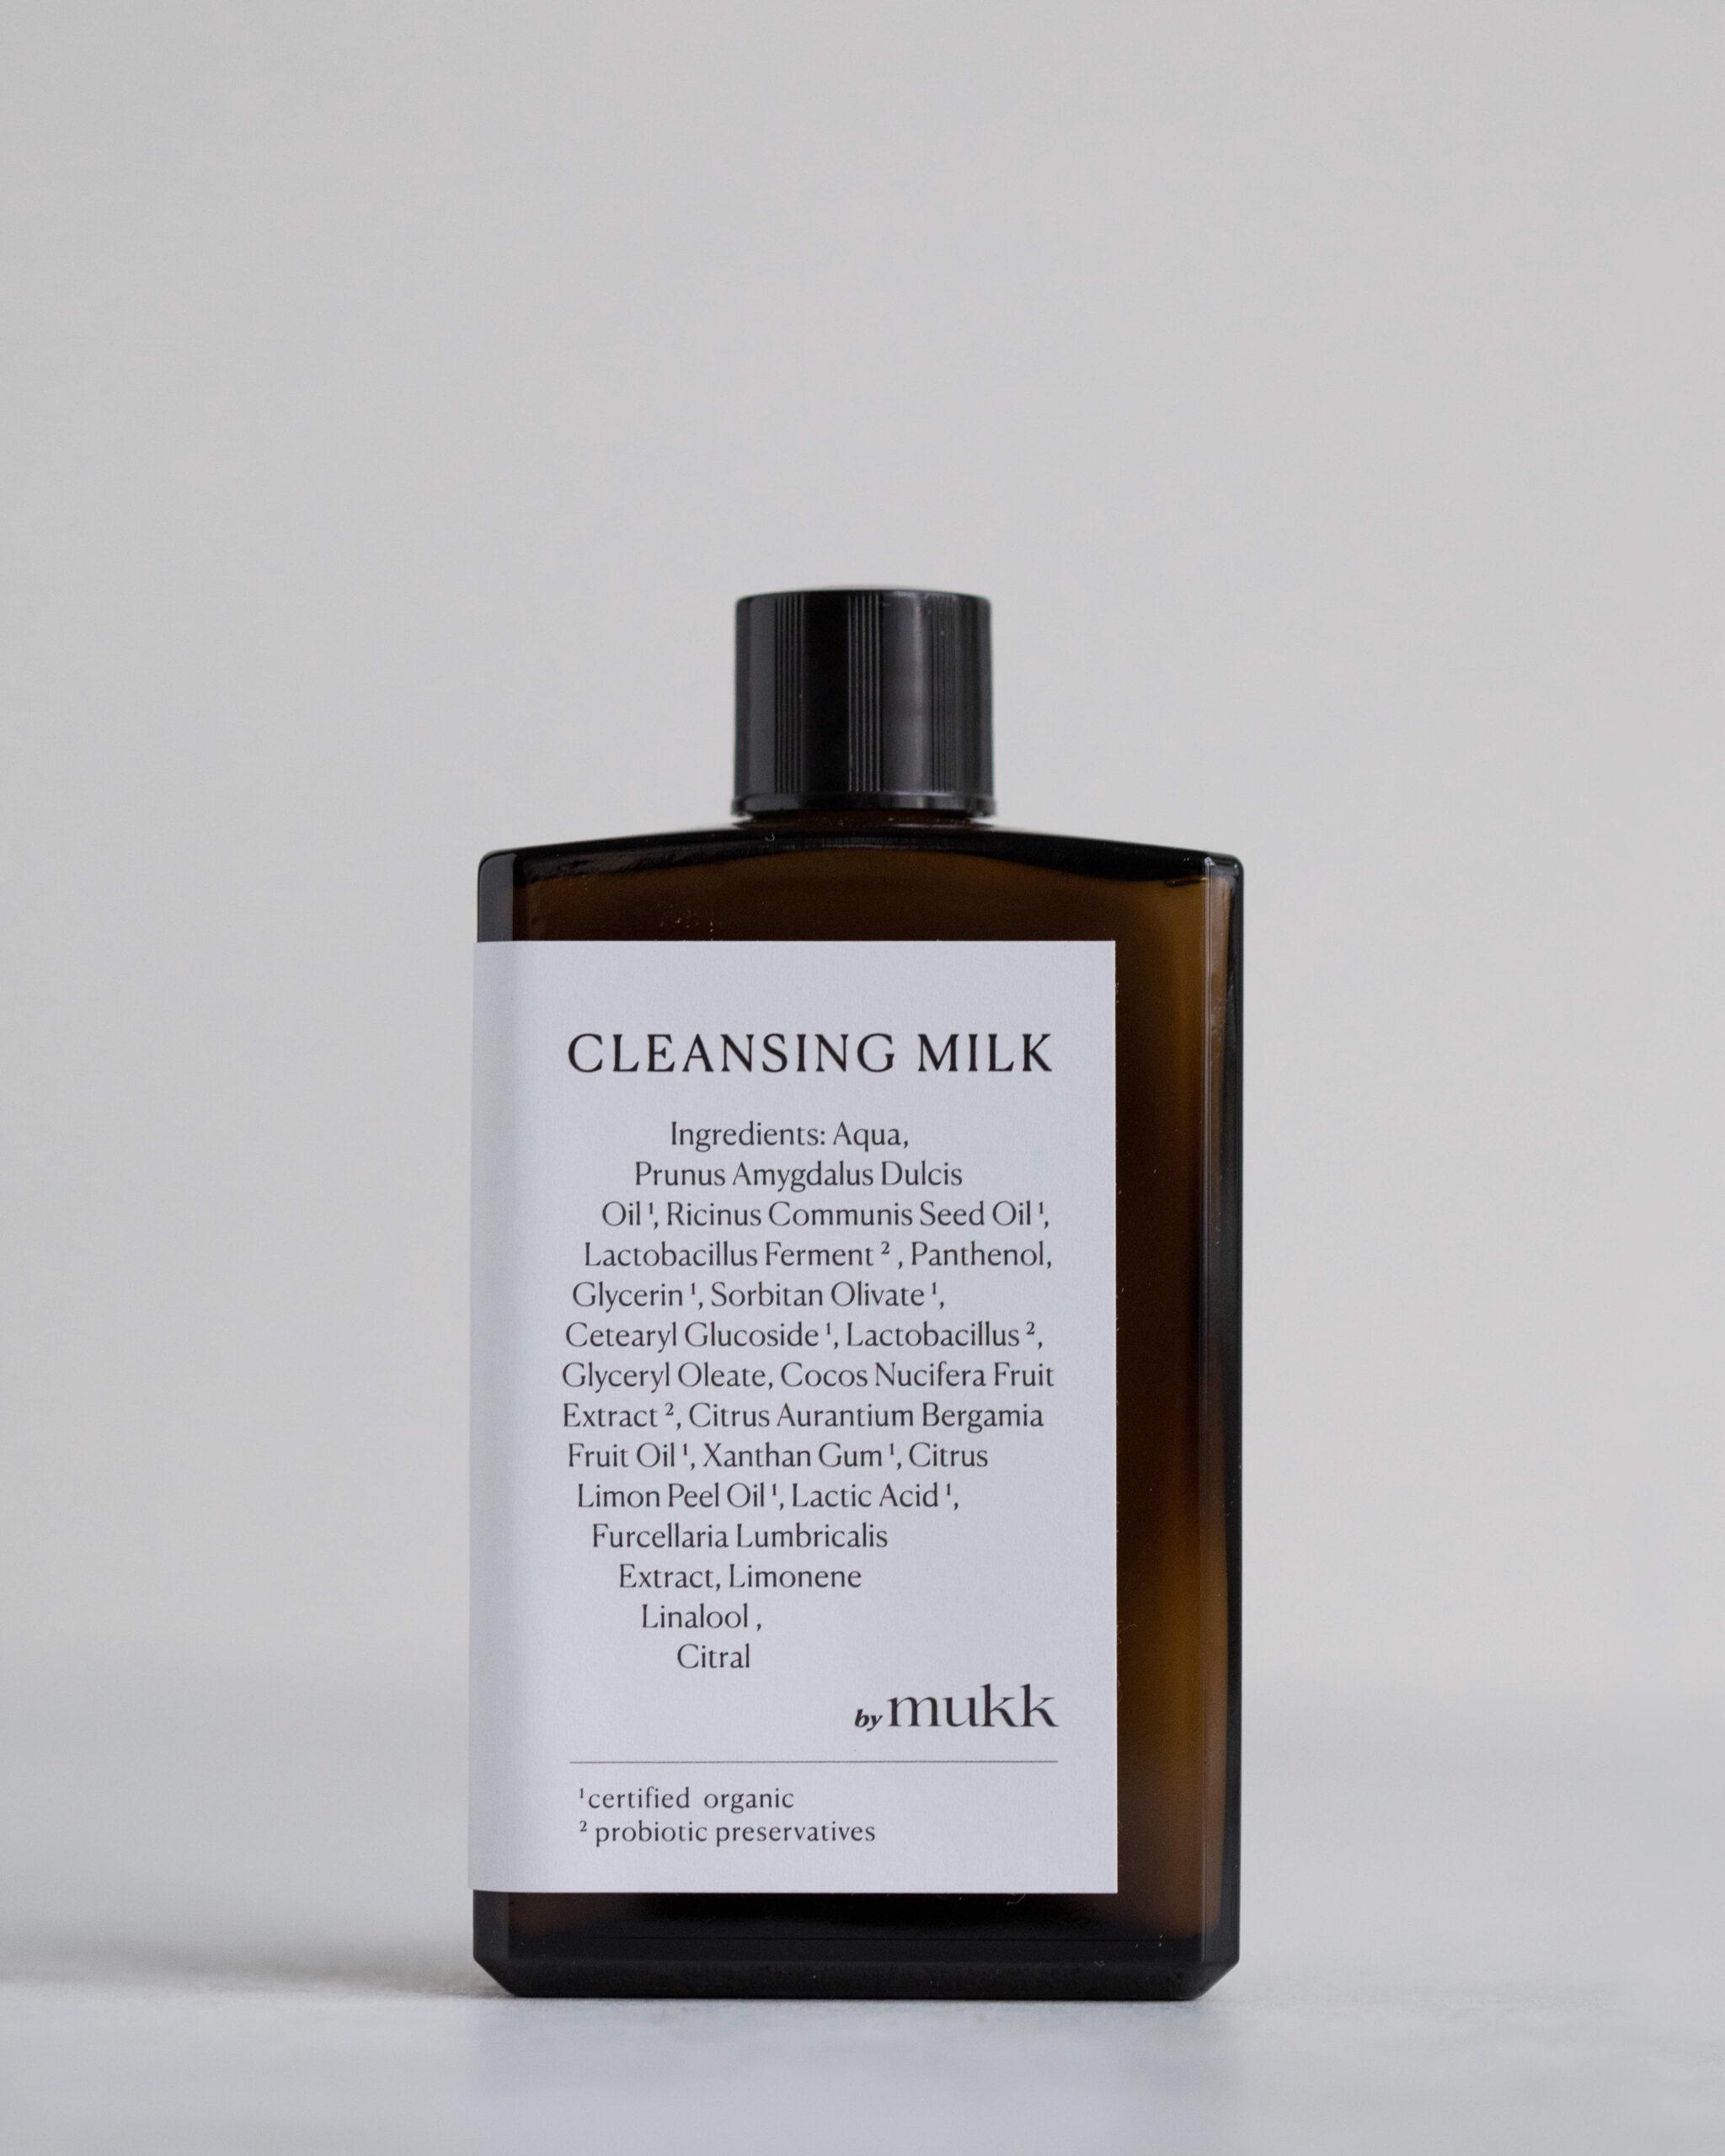 by mukk Cleansing Milk